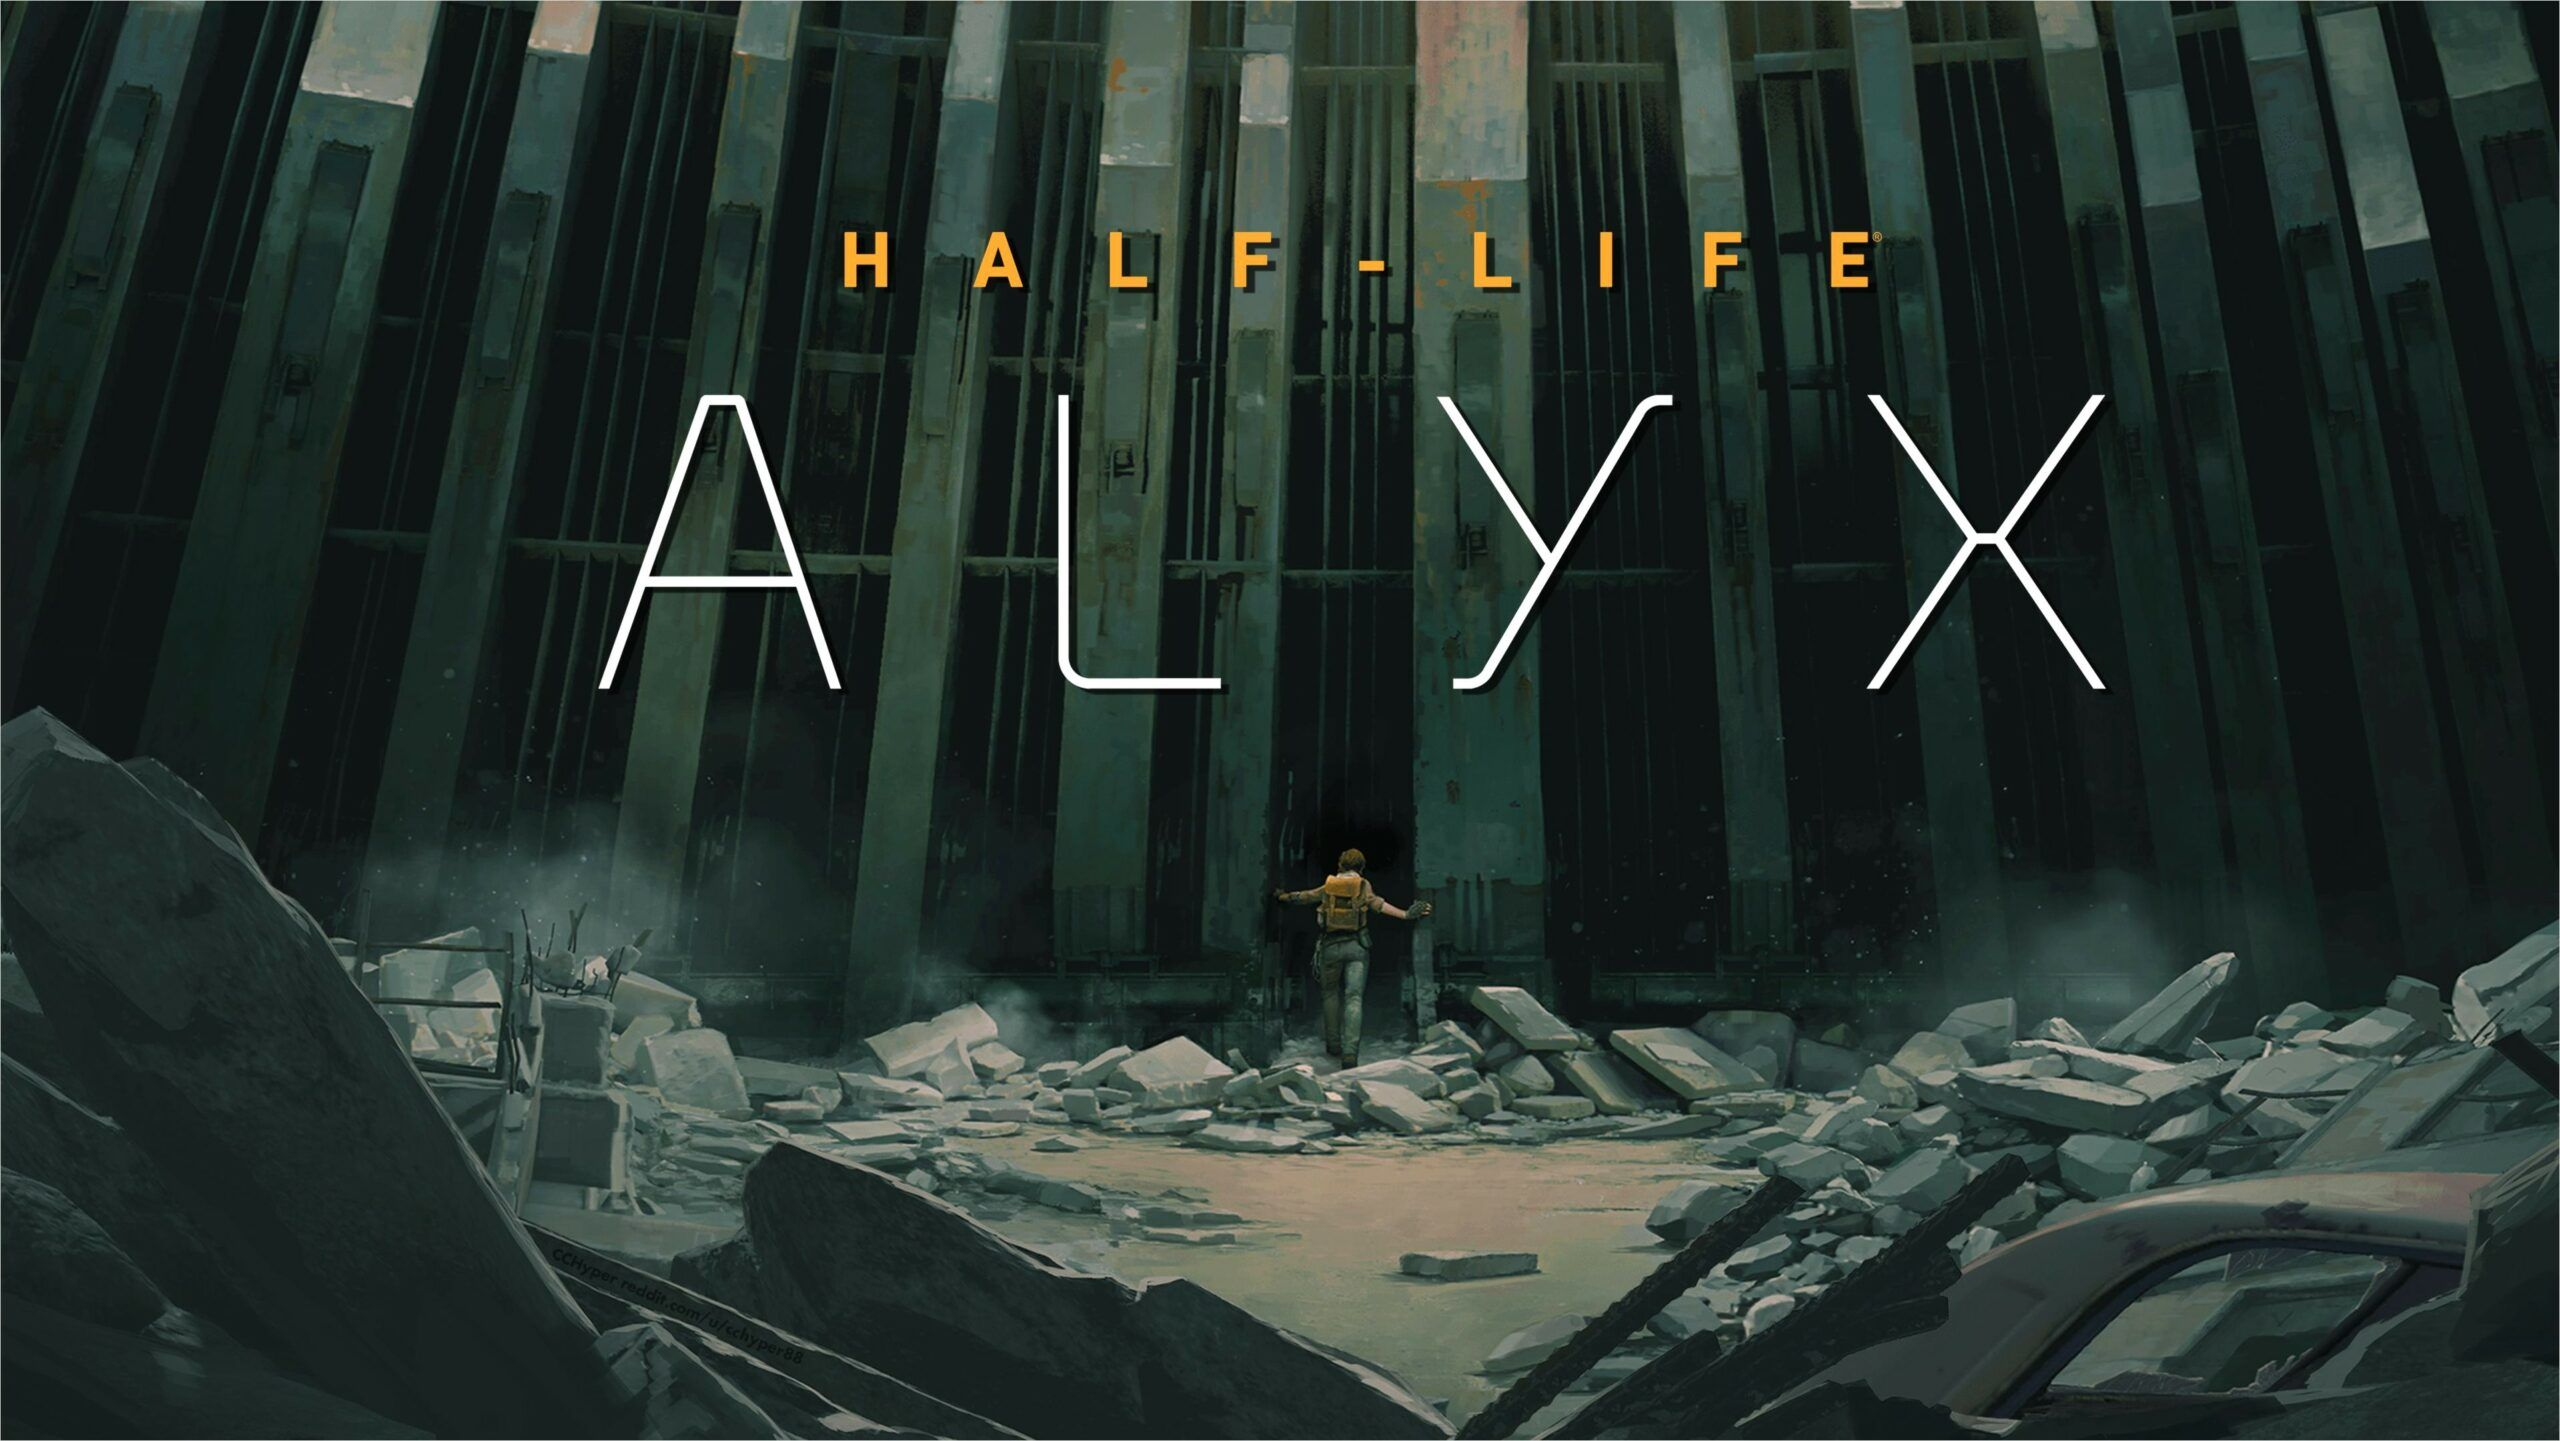 Half Life Wallpaper 4k in 2020 Virtual reality games